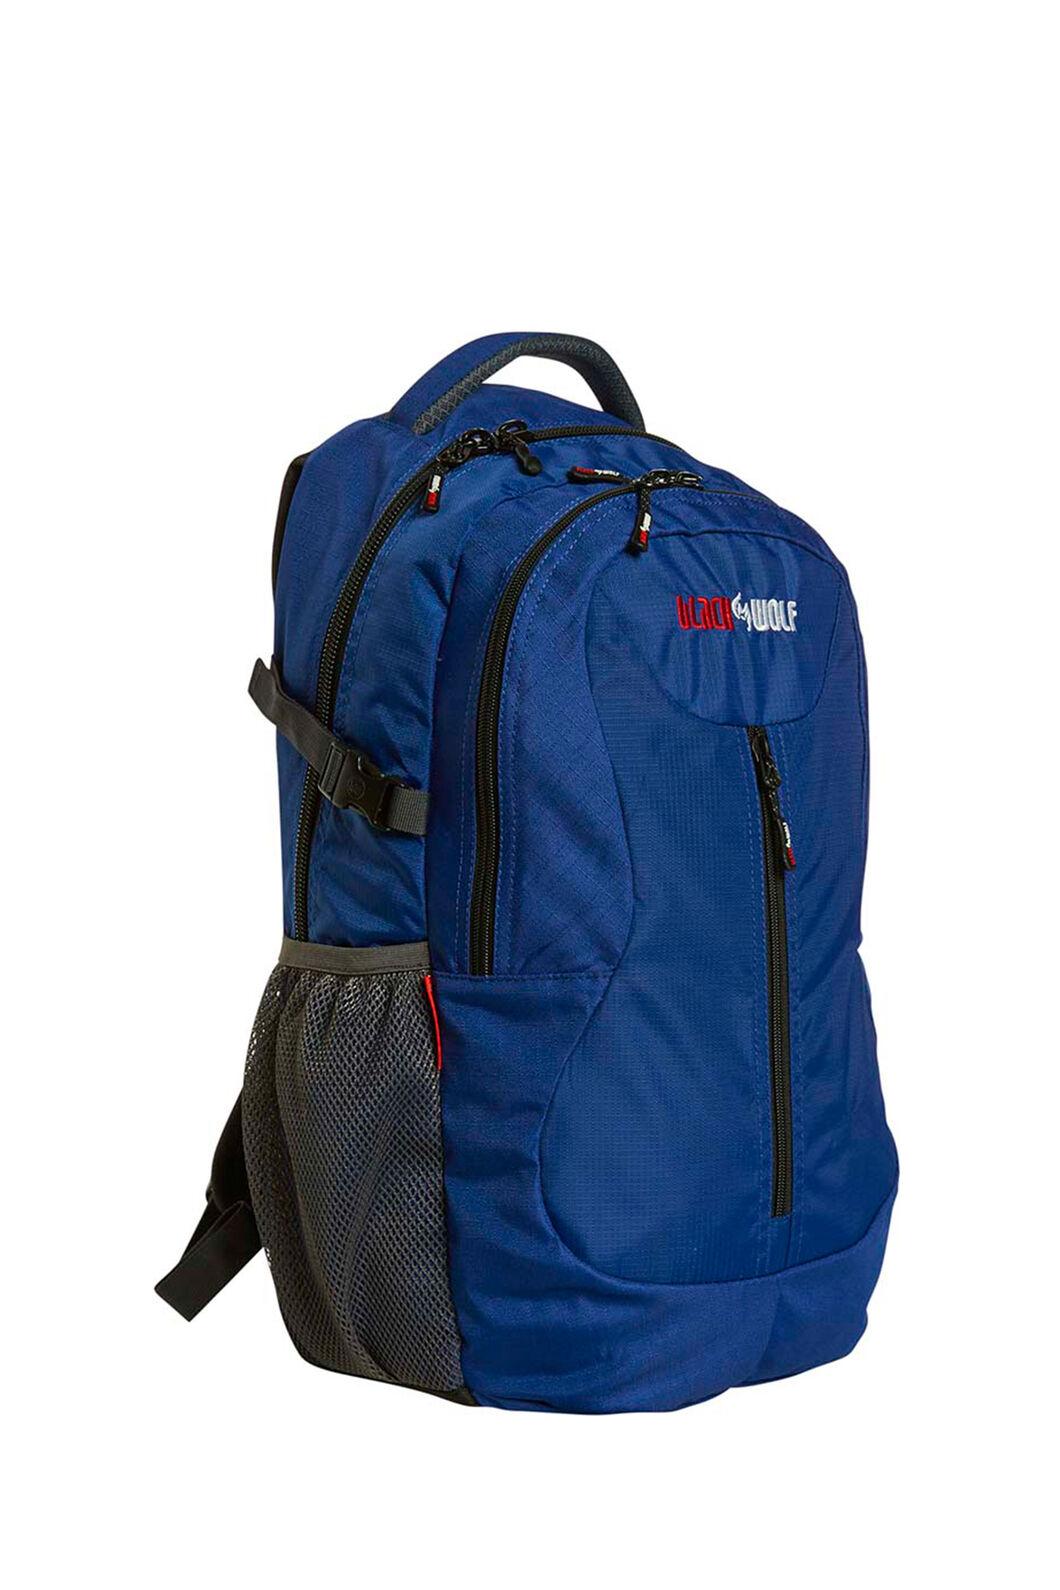 BlackWolf Dart 30L Day Pack, Blue, hi-res